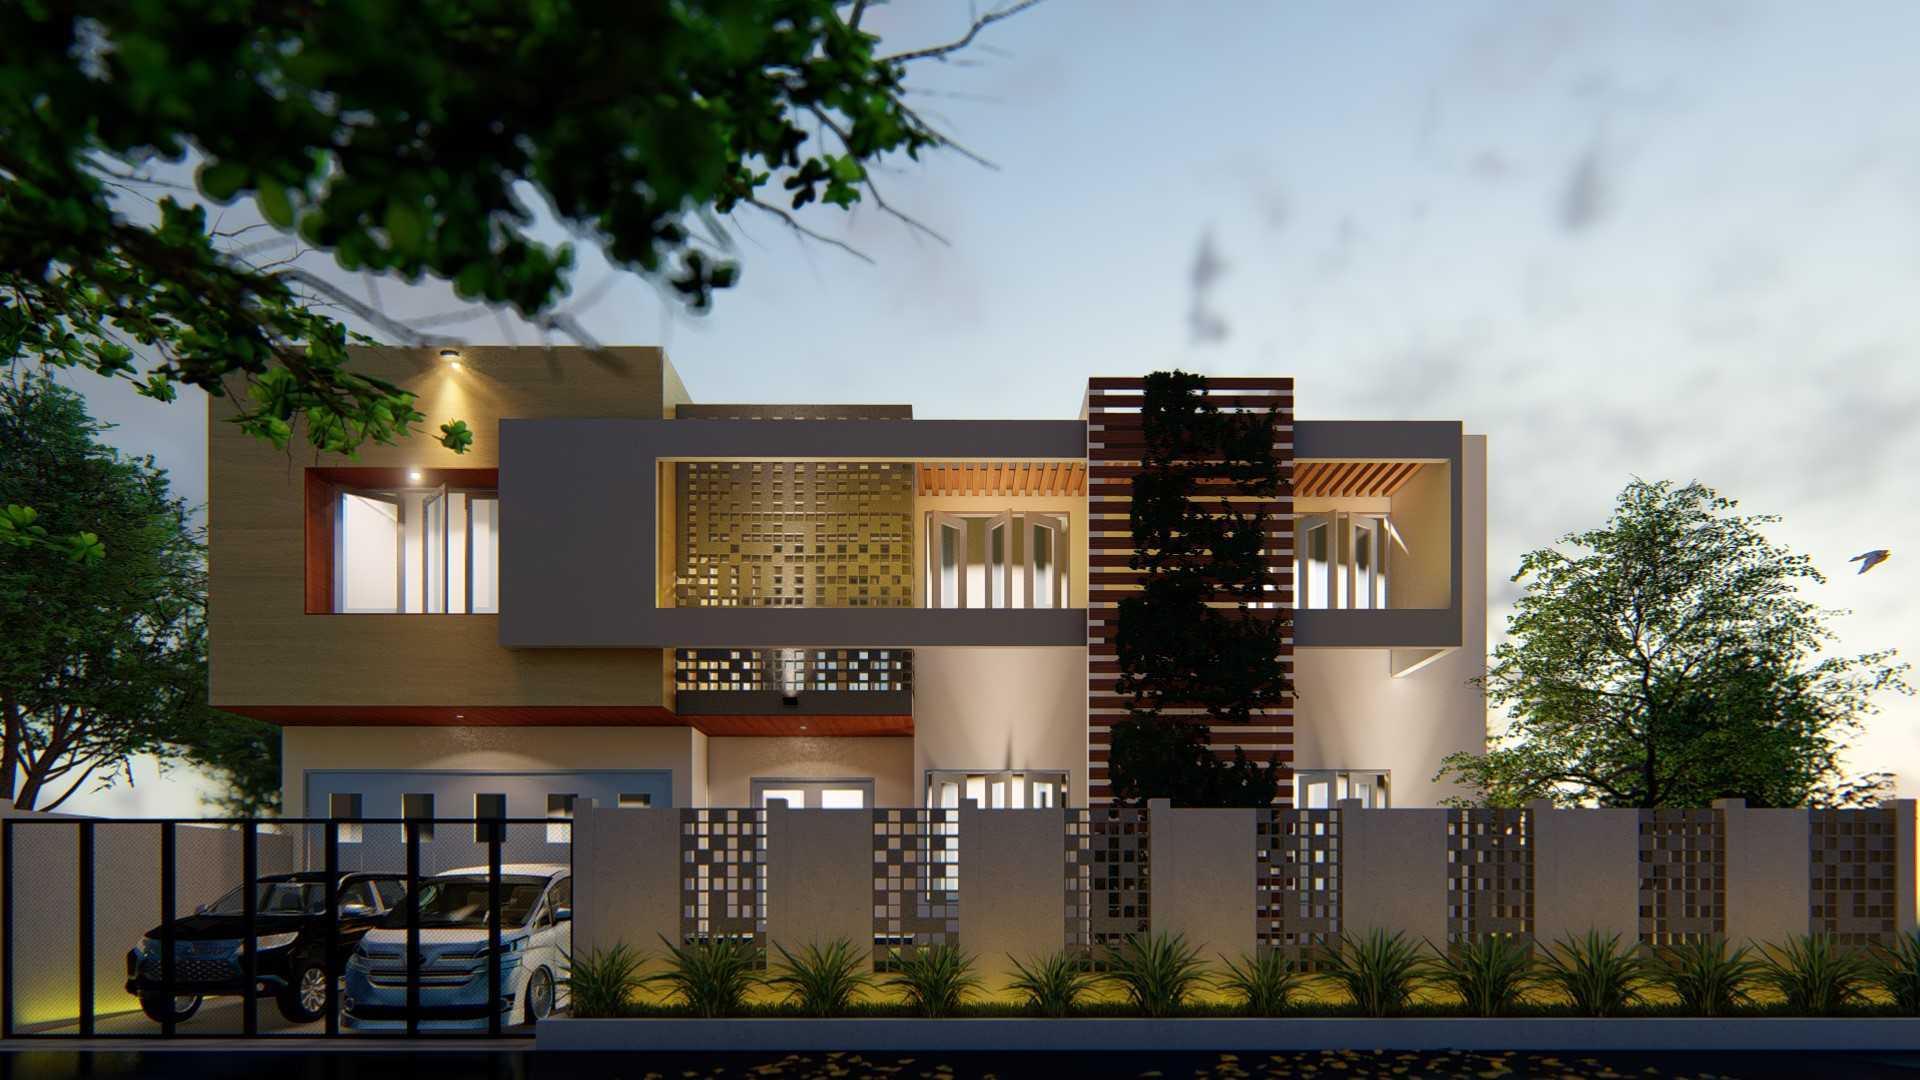 Strata Architect J-House Kabupaten Lombok Barat, Nusa Tenggara Bar., Indonesia Kabupaten Lombok Barat, Nusa Tenggara Bar., Indonesia Strata-Architect-J-House   99055